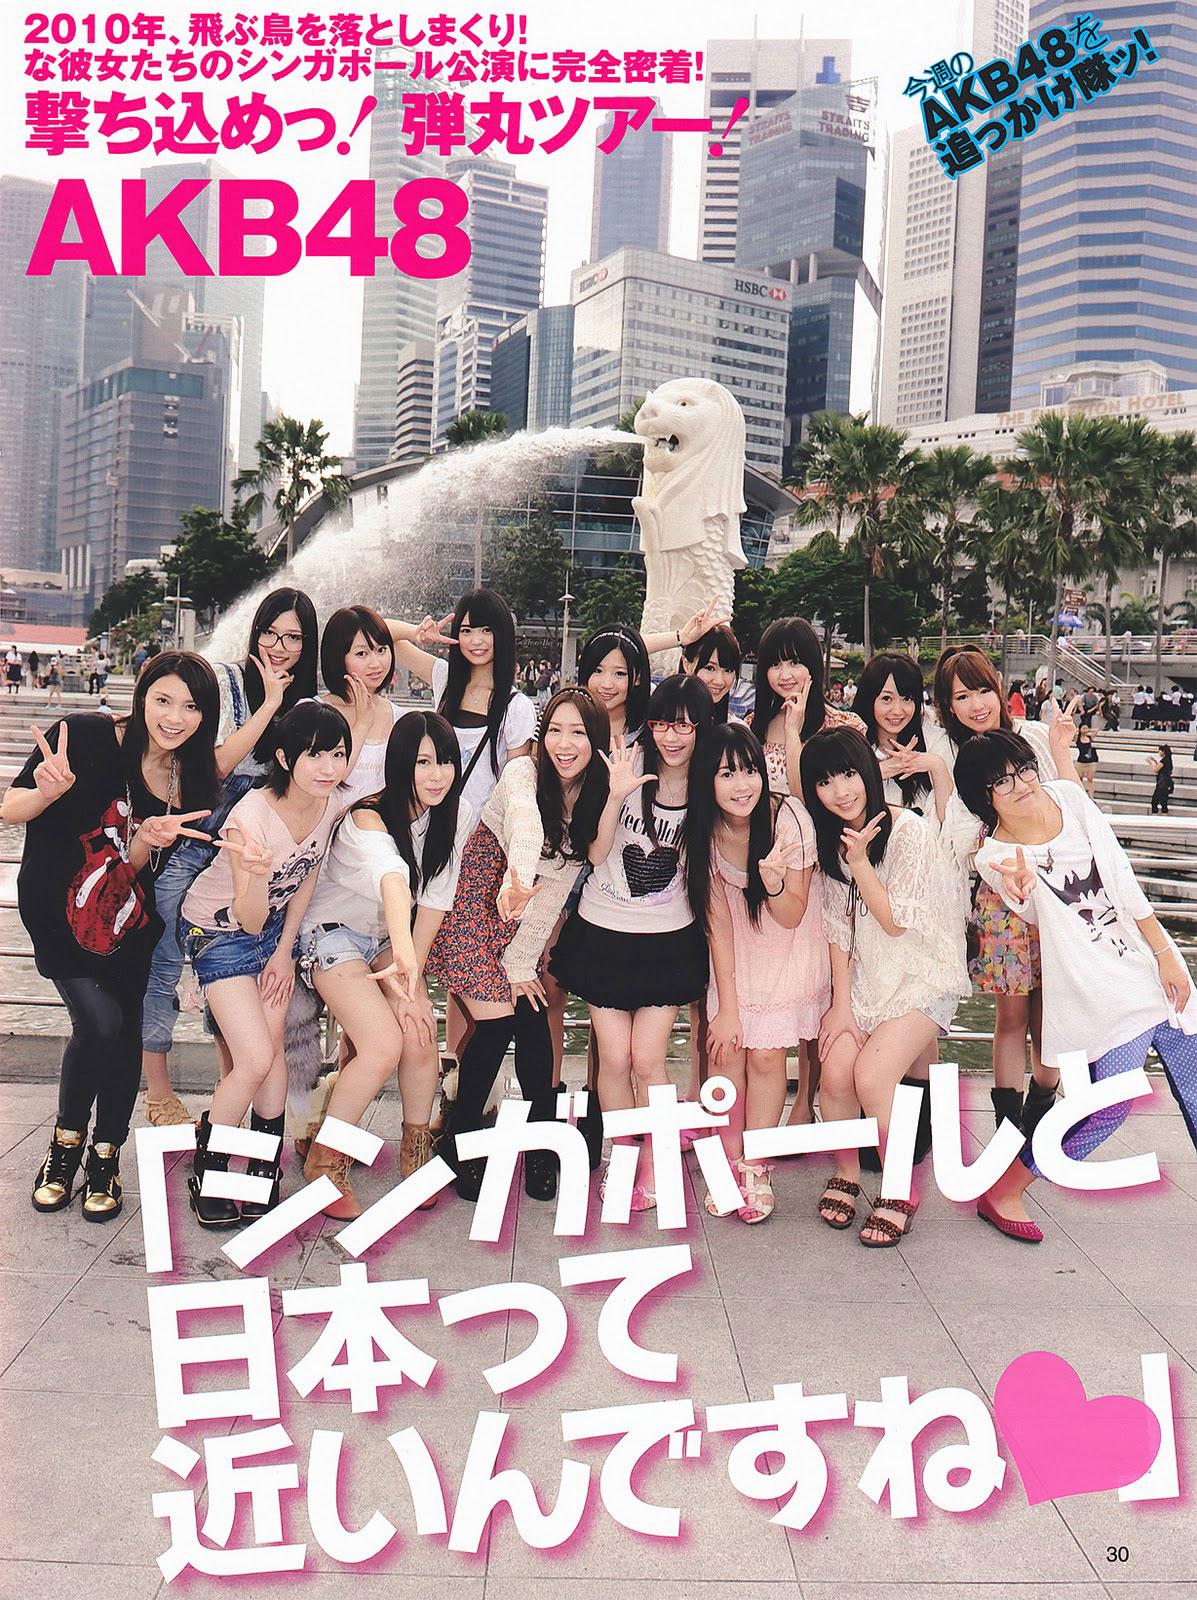 Japanese girl group AKB48 in Singapore